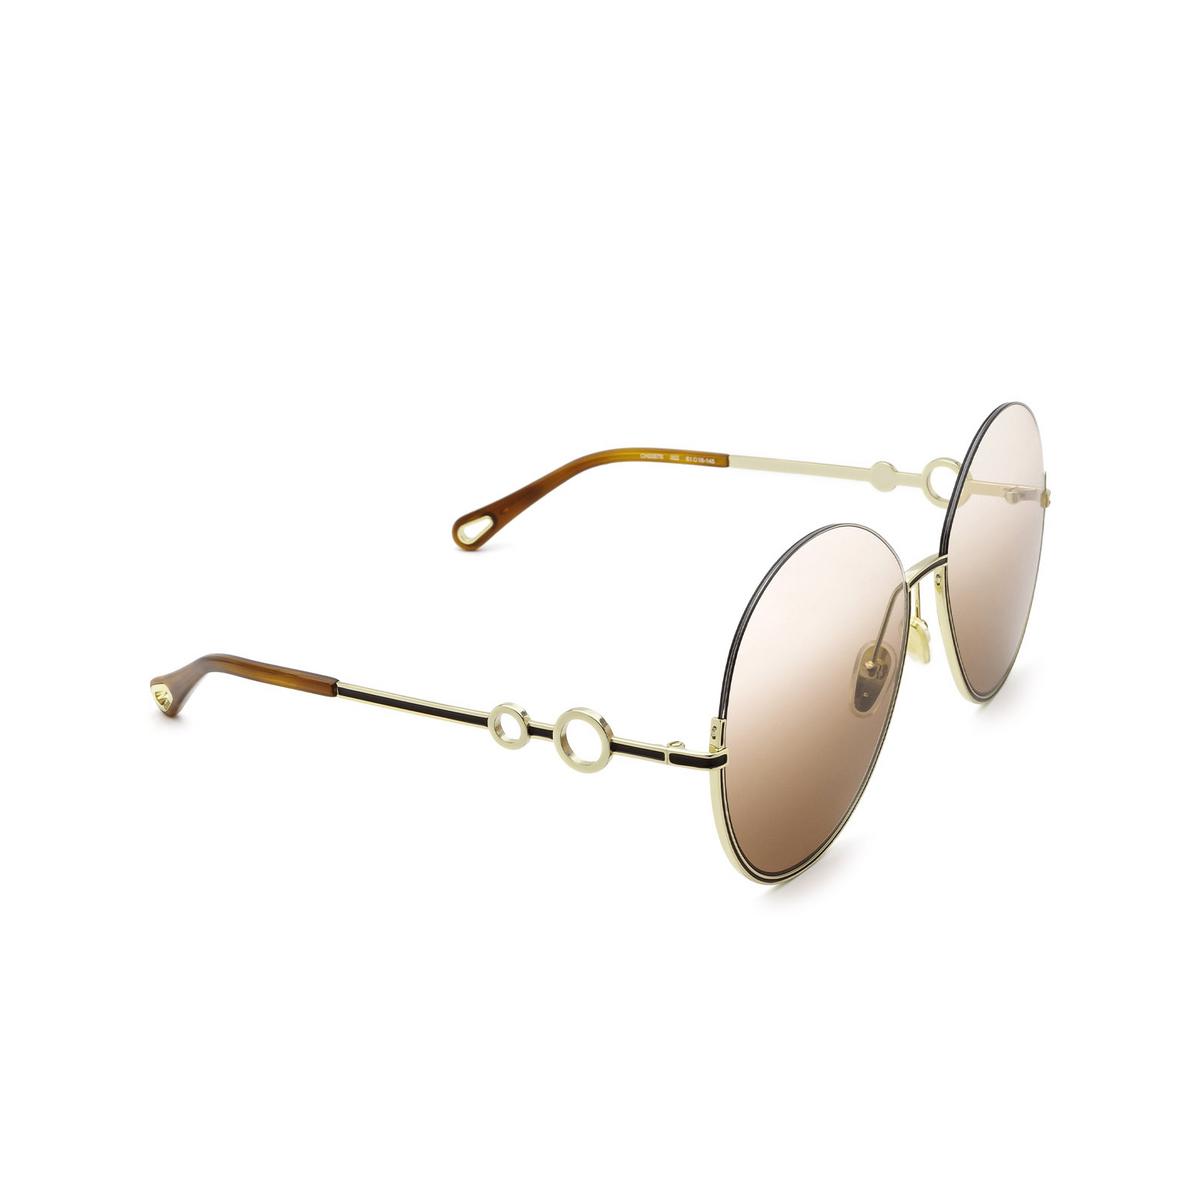 Chloé® Round Sunglasses: CH0067S color Gold 002 - three-quarters view.